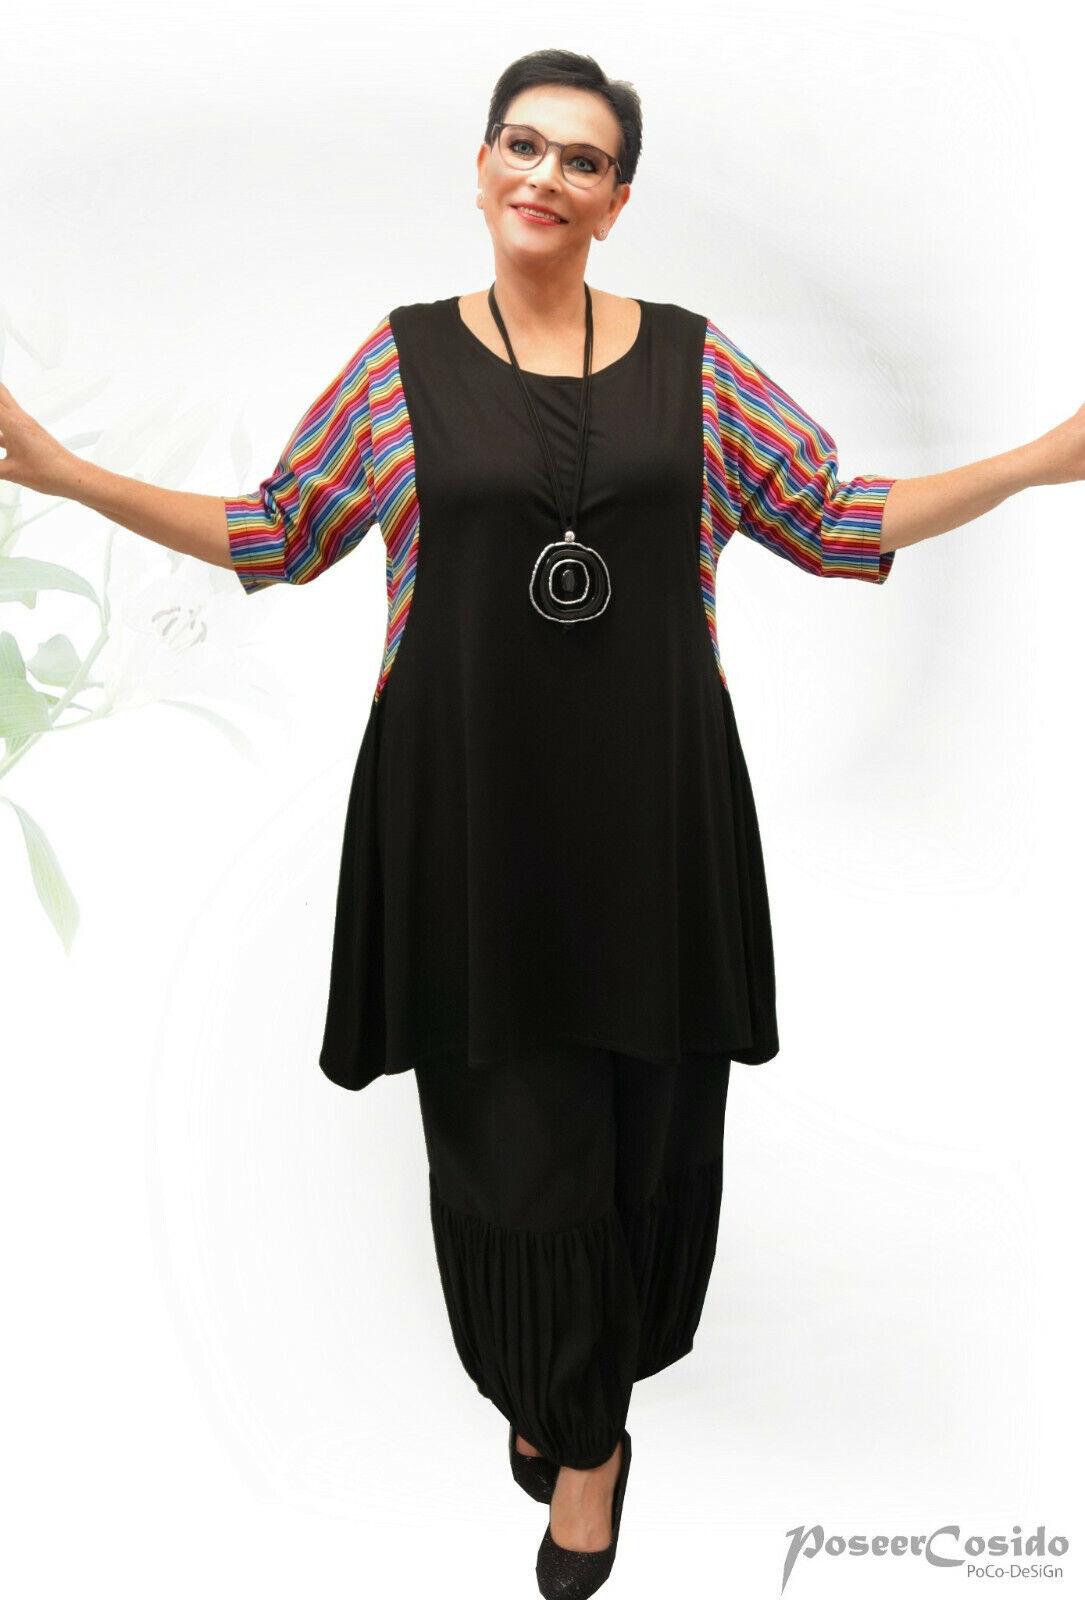 PoCo DeSiGn LAGENLOOK Tunika Long-Shirt  44-46-48-50-52-54-56  L-XL-XXL-XXXL